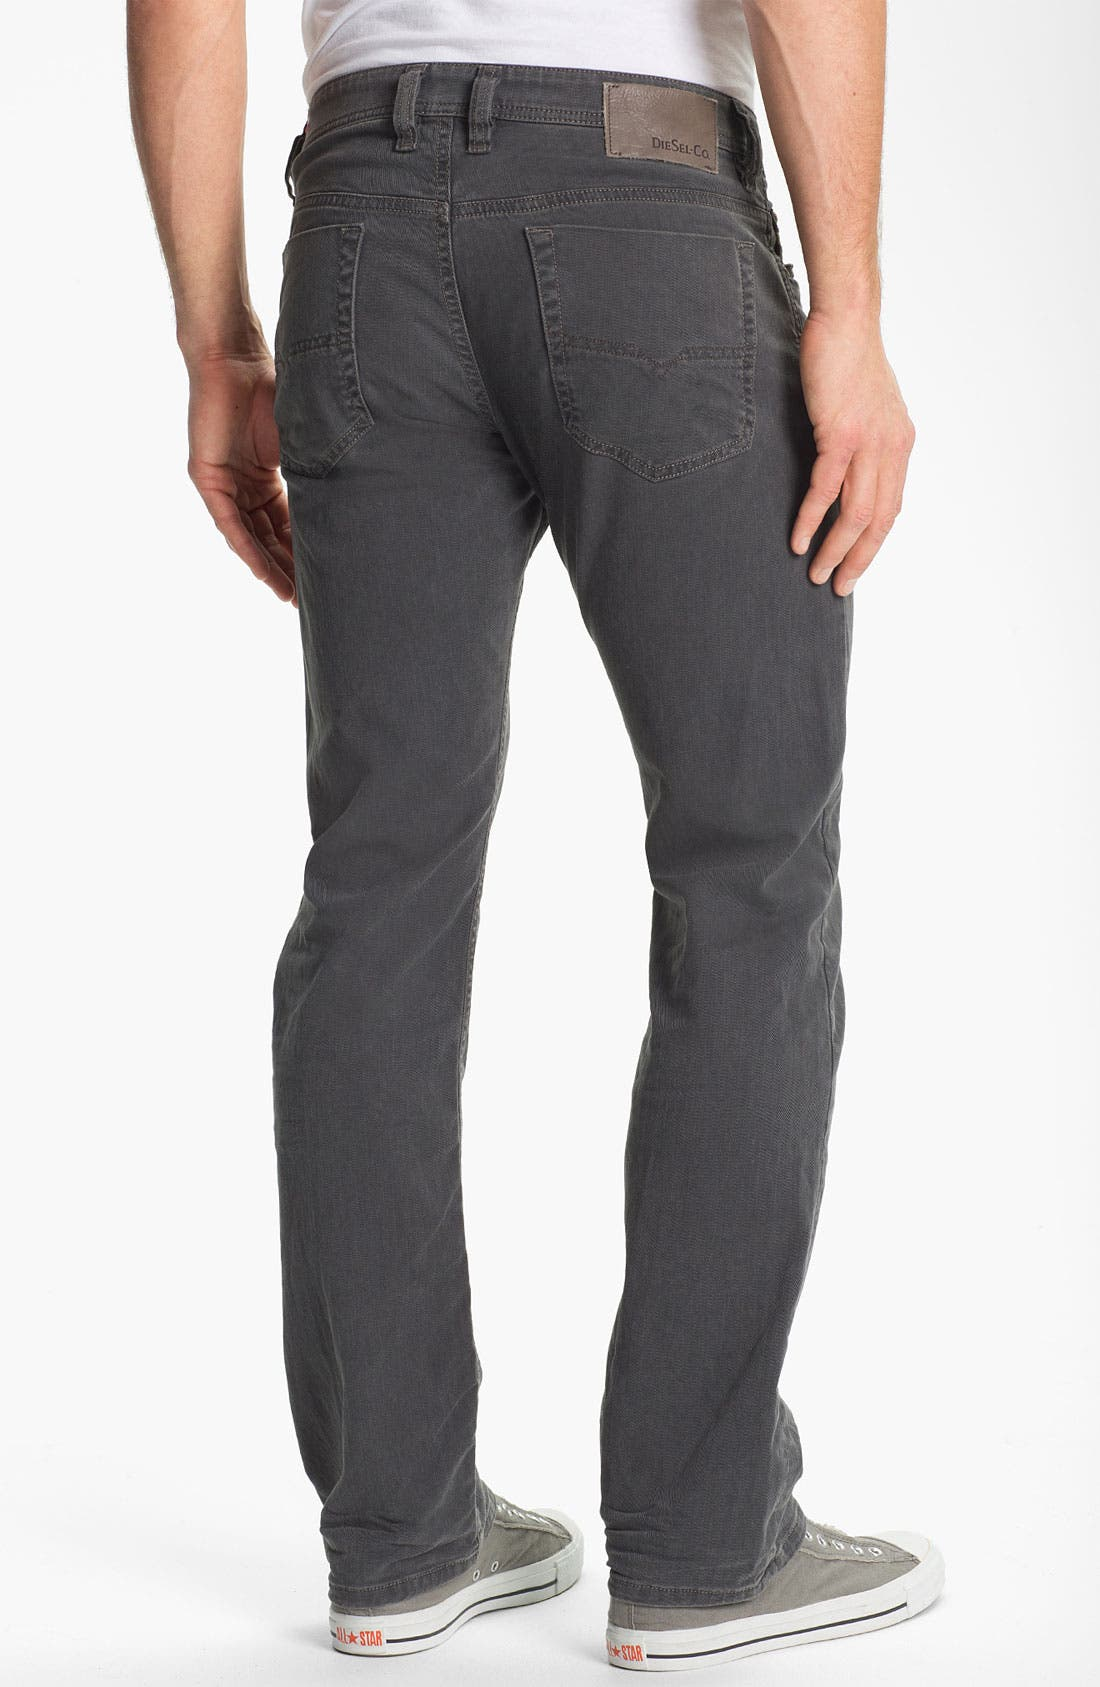 Alternate Image 1 Selected - DIESEL® 'Viker' Straight Leg Jeans (Grey)